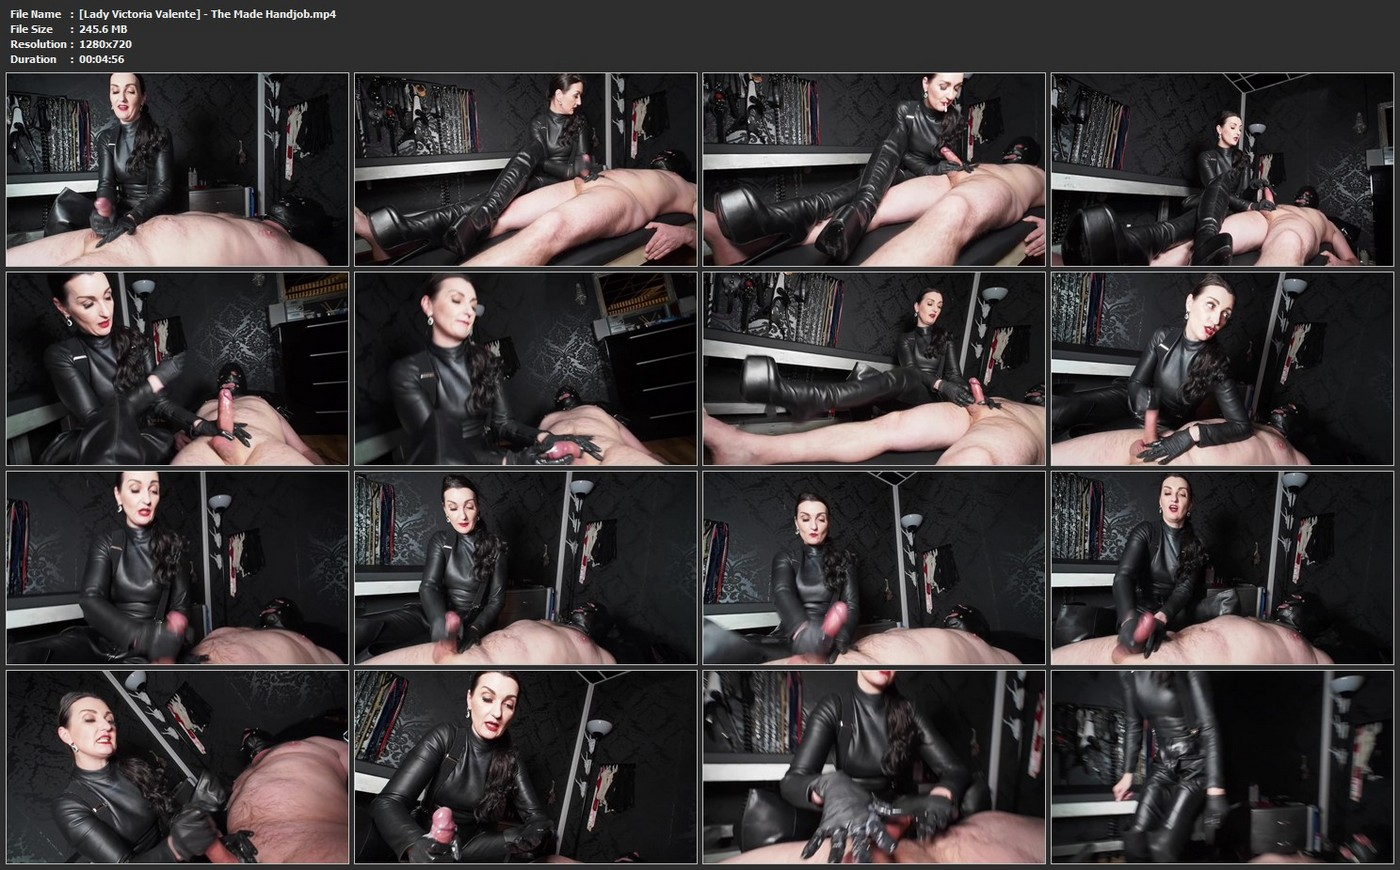 Download: Lady Victoria Valente - The Made Handjob!mp4